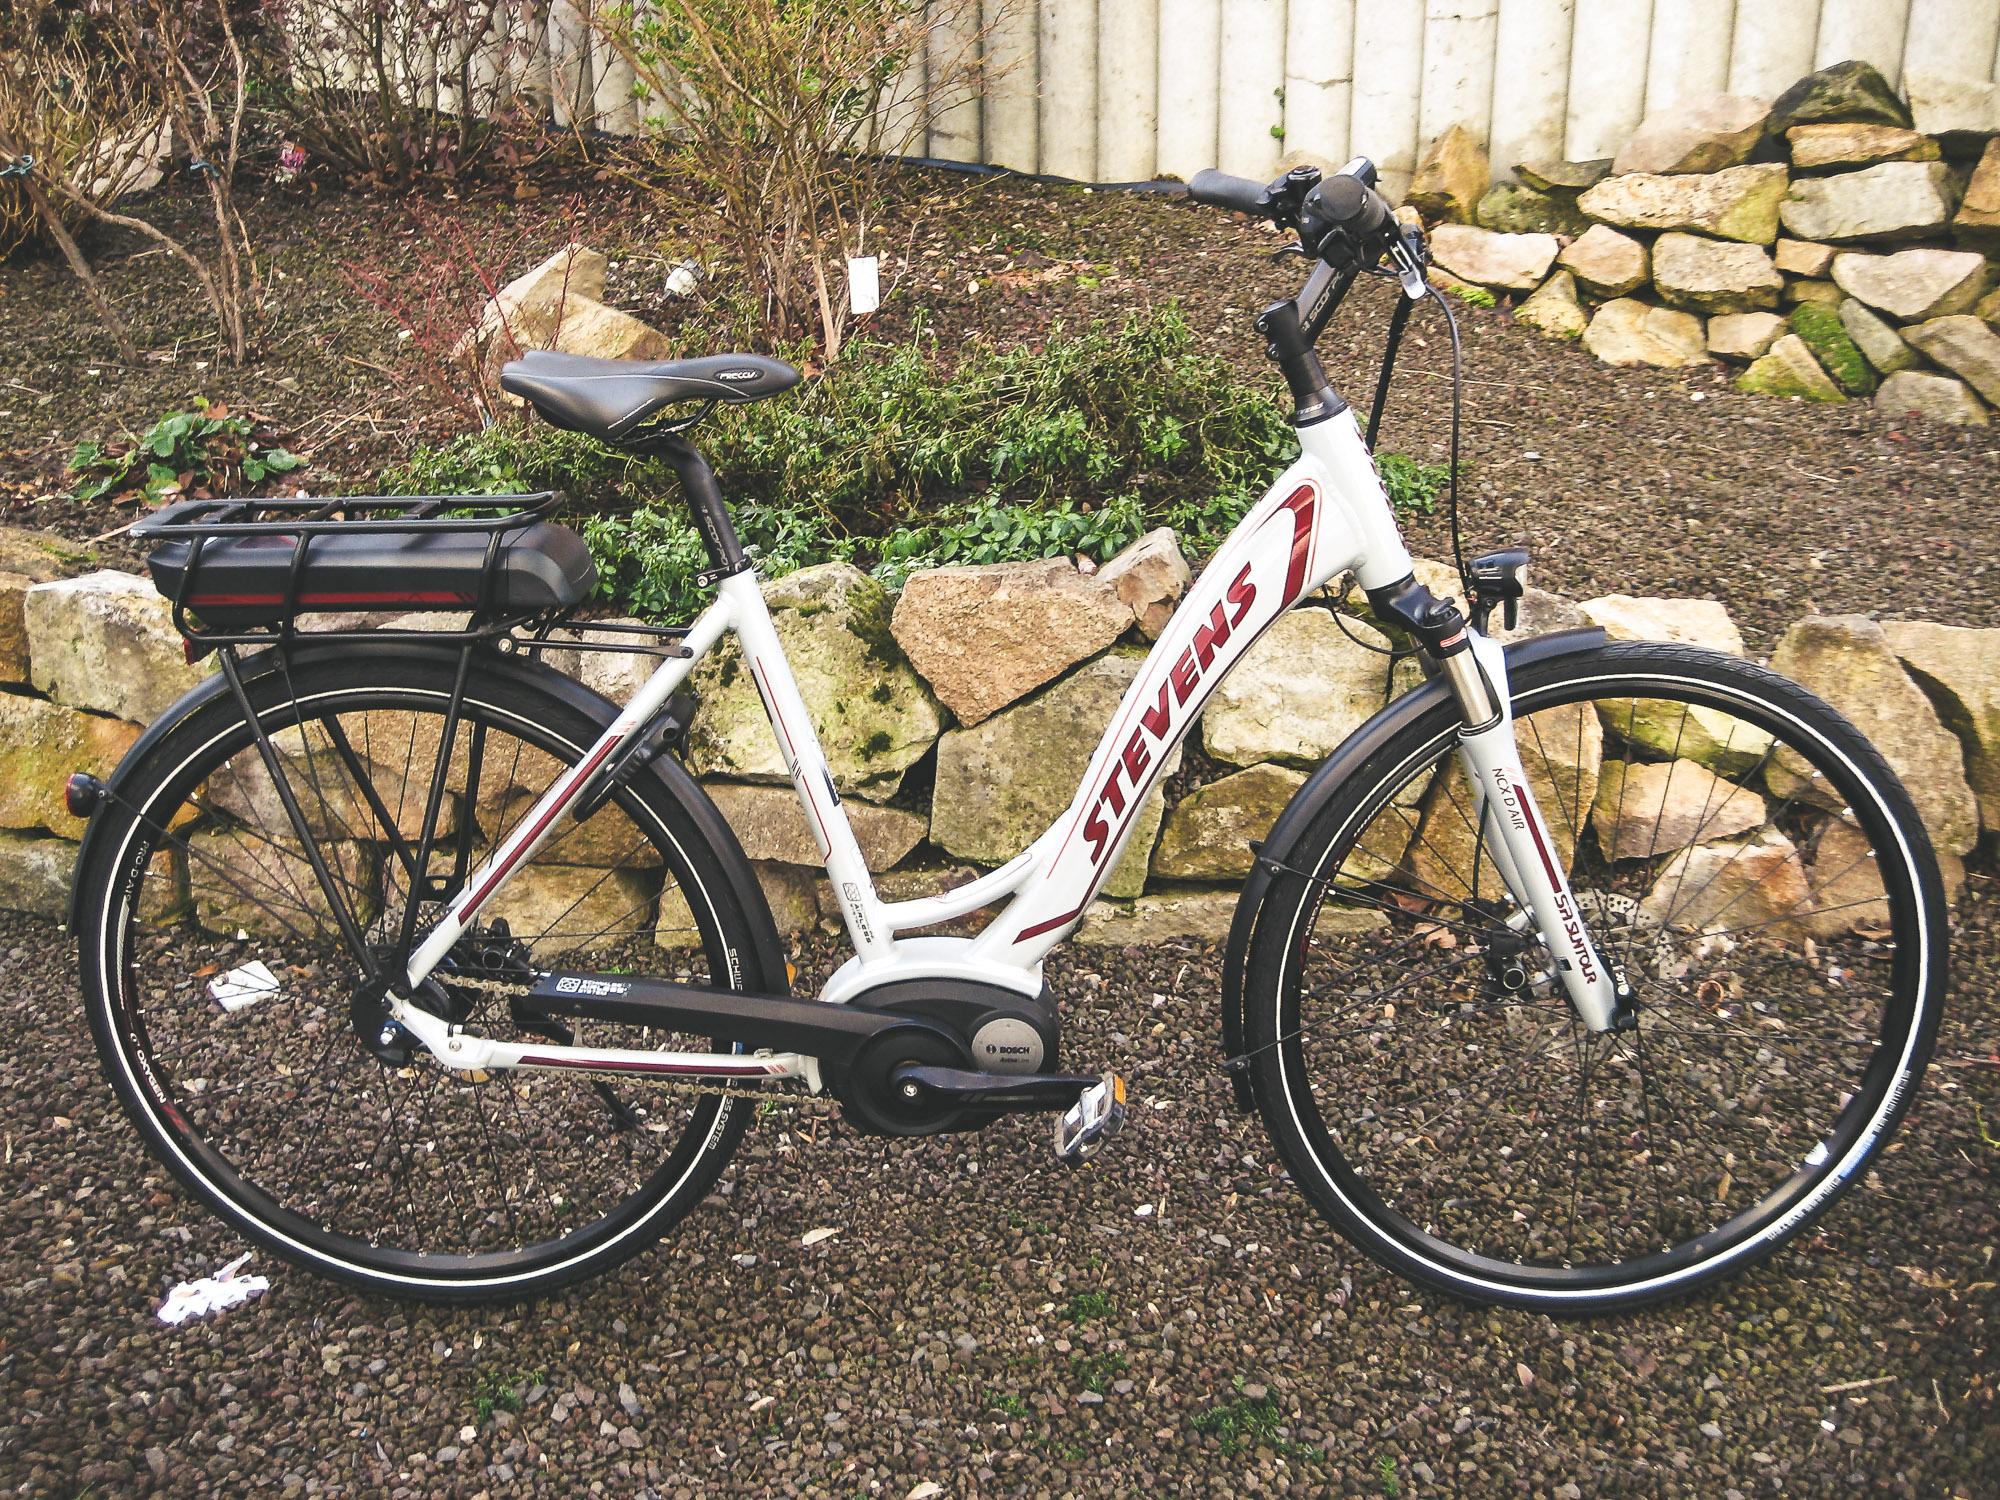 Asb Die Fahrradwerkstatt